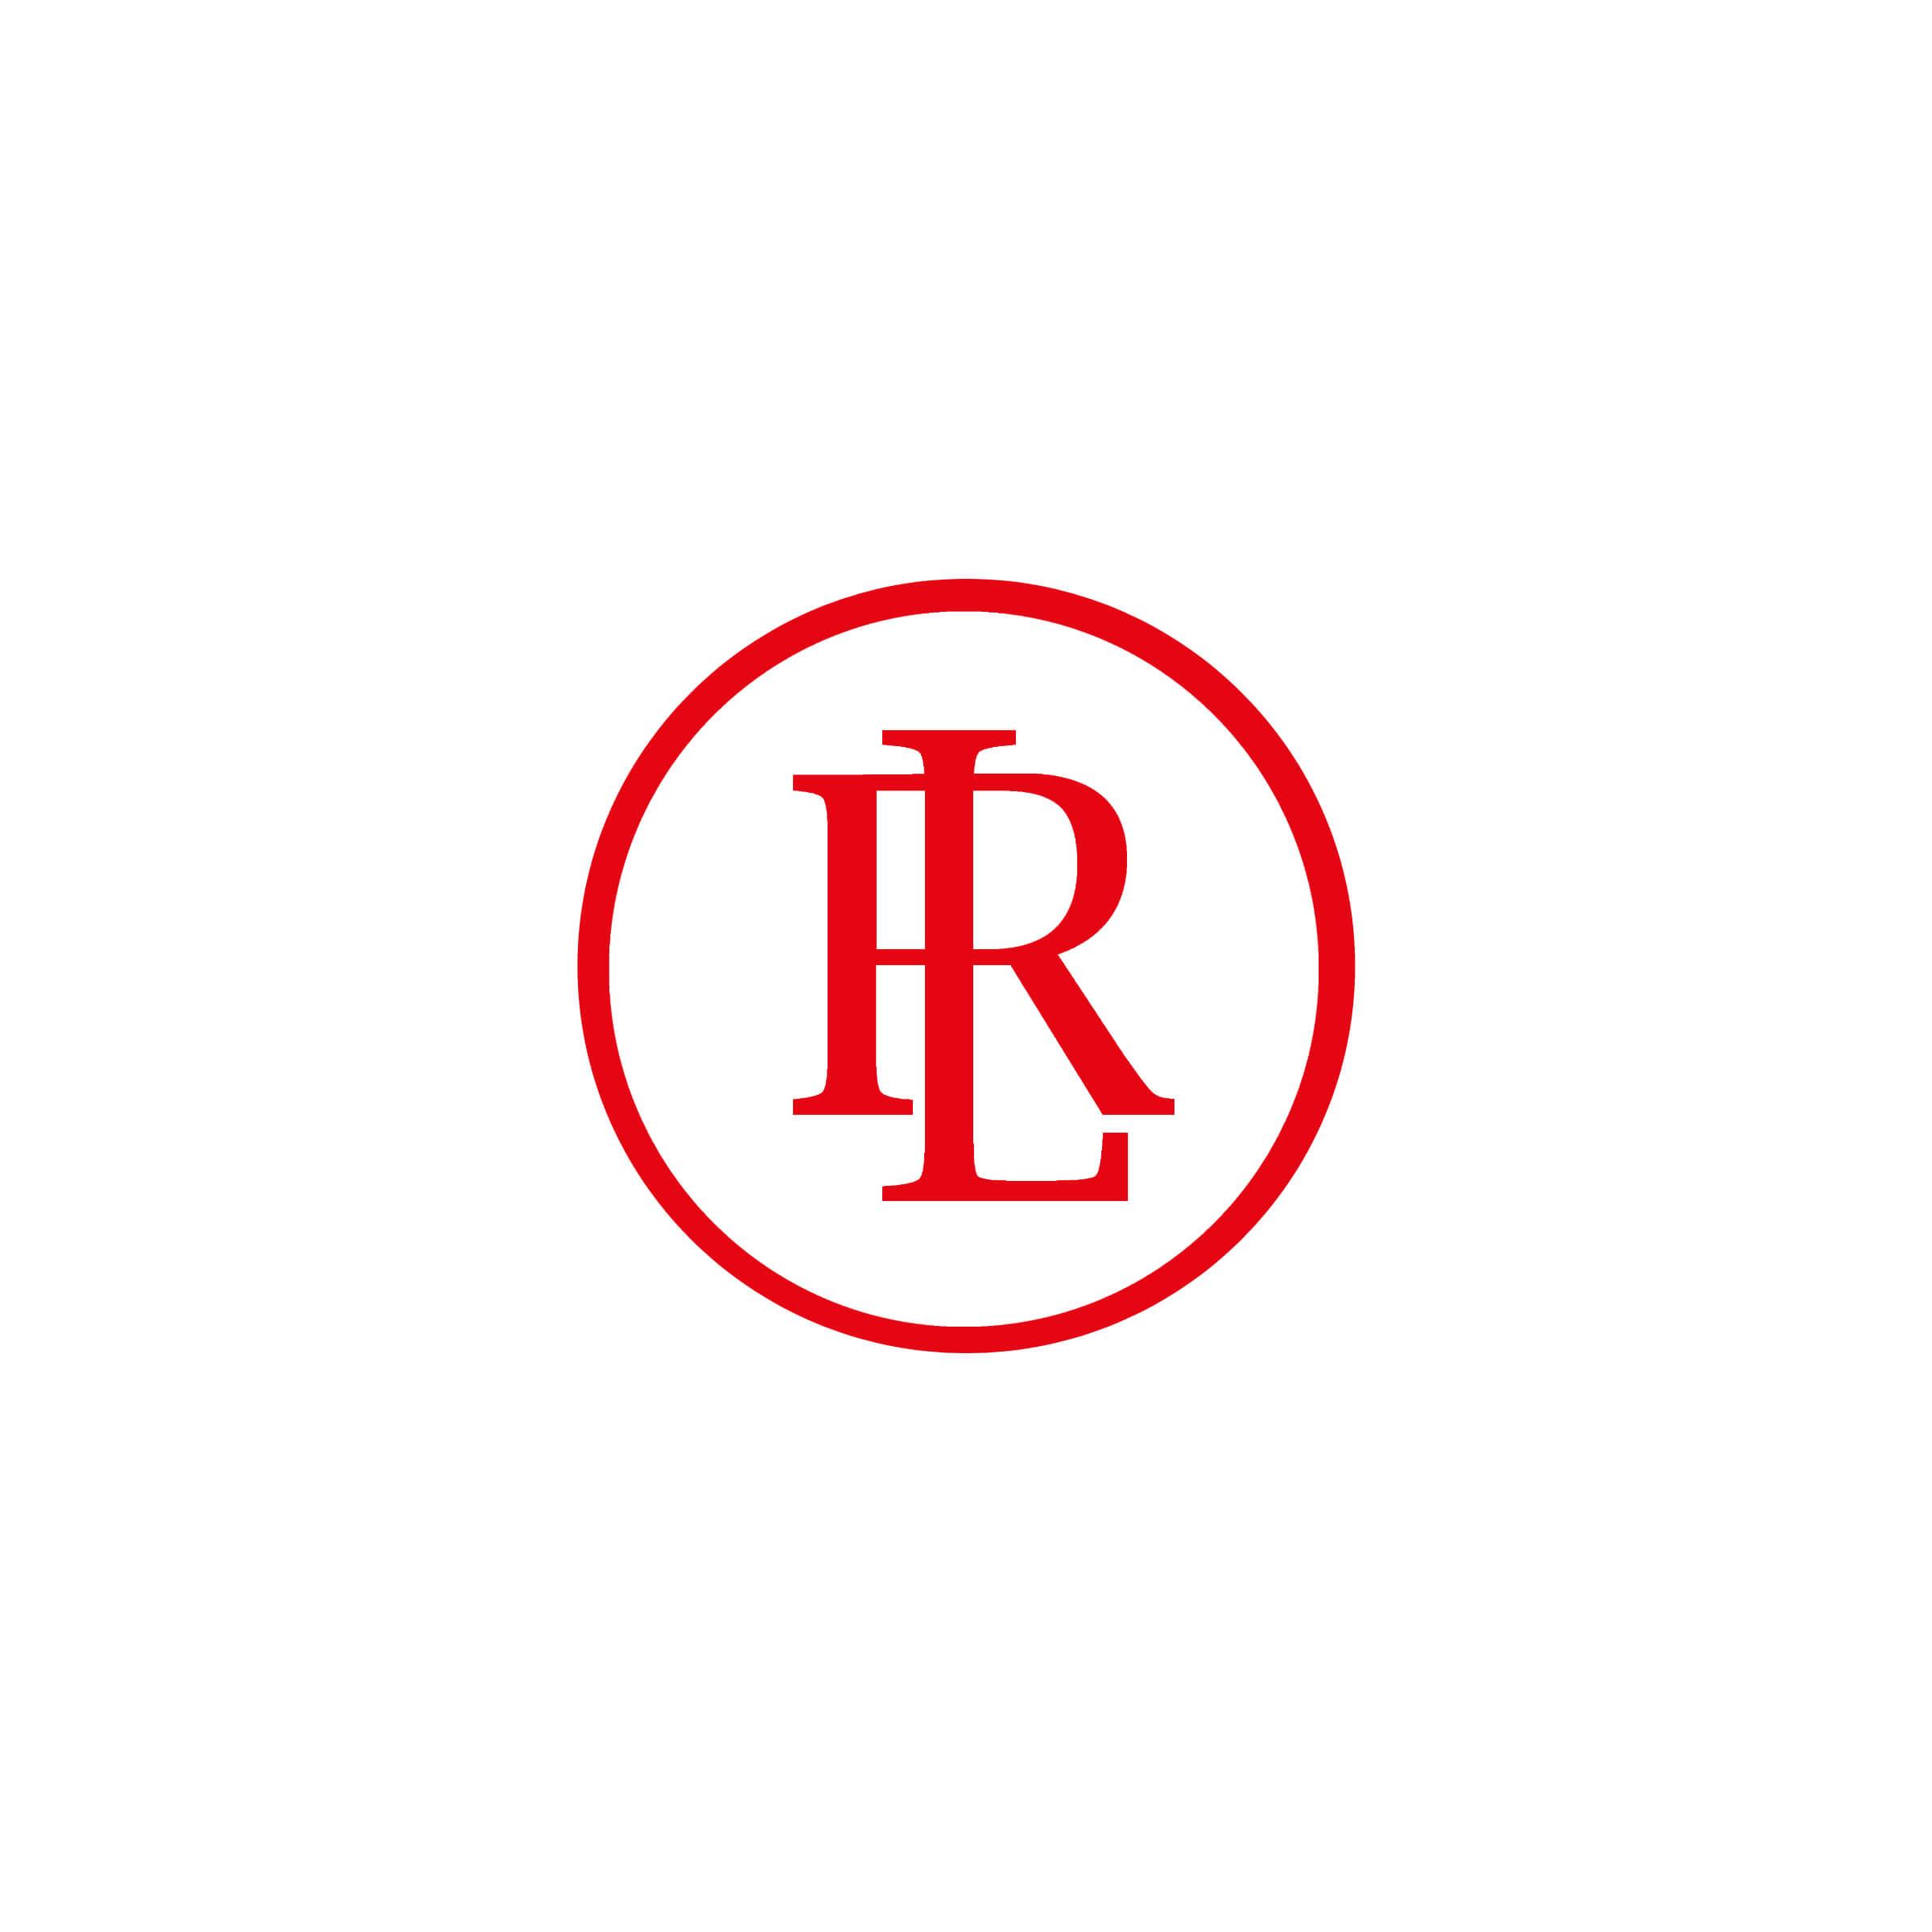 C2 spiegel L (hm)